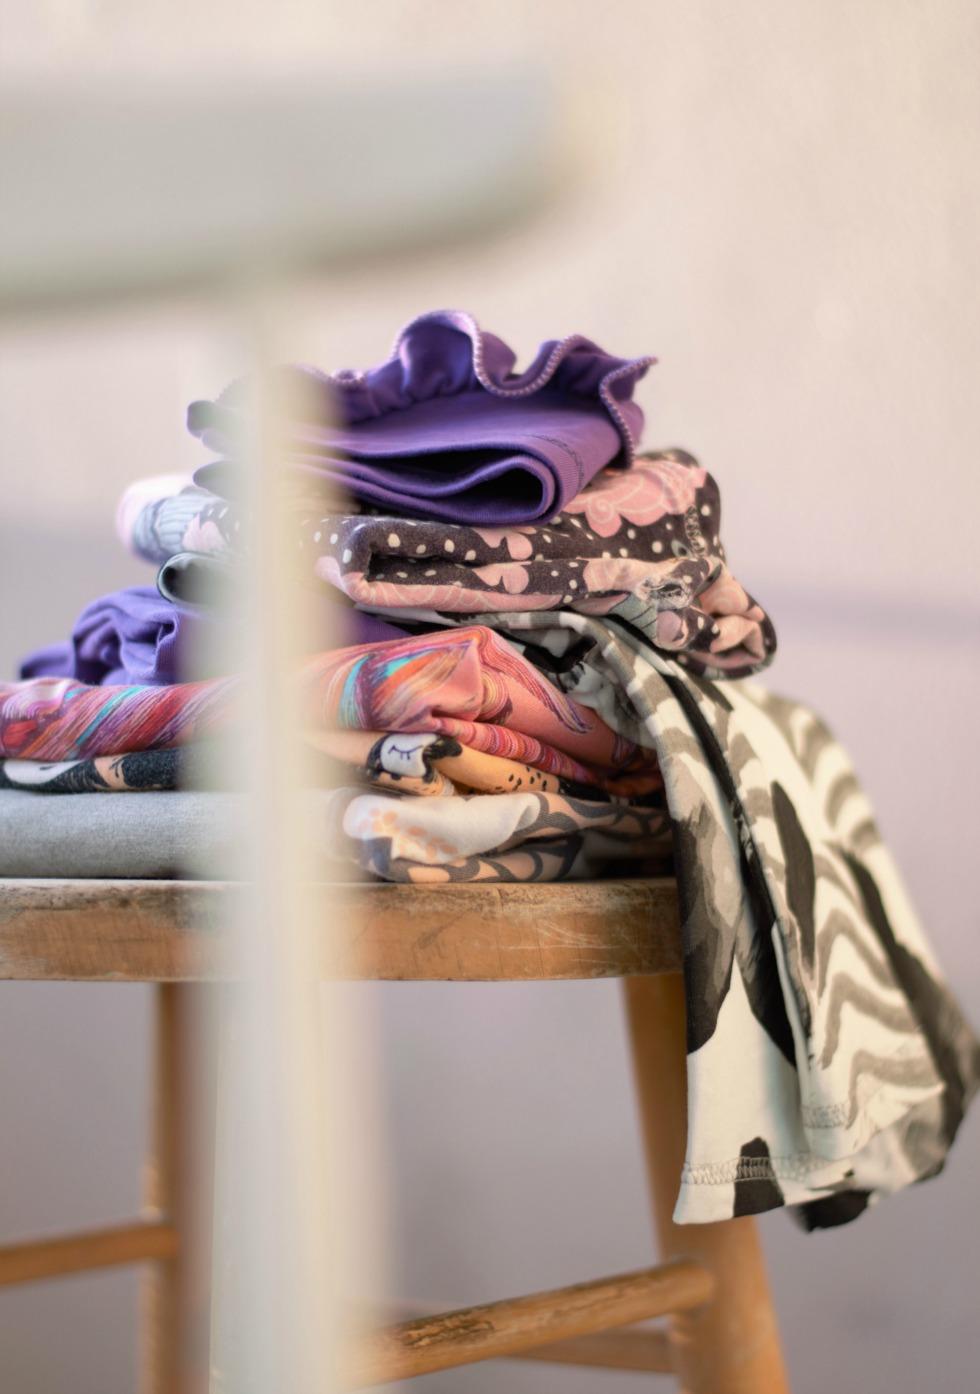 trikoovaatteiden ompelu